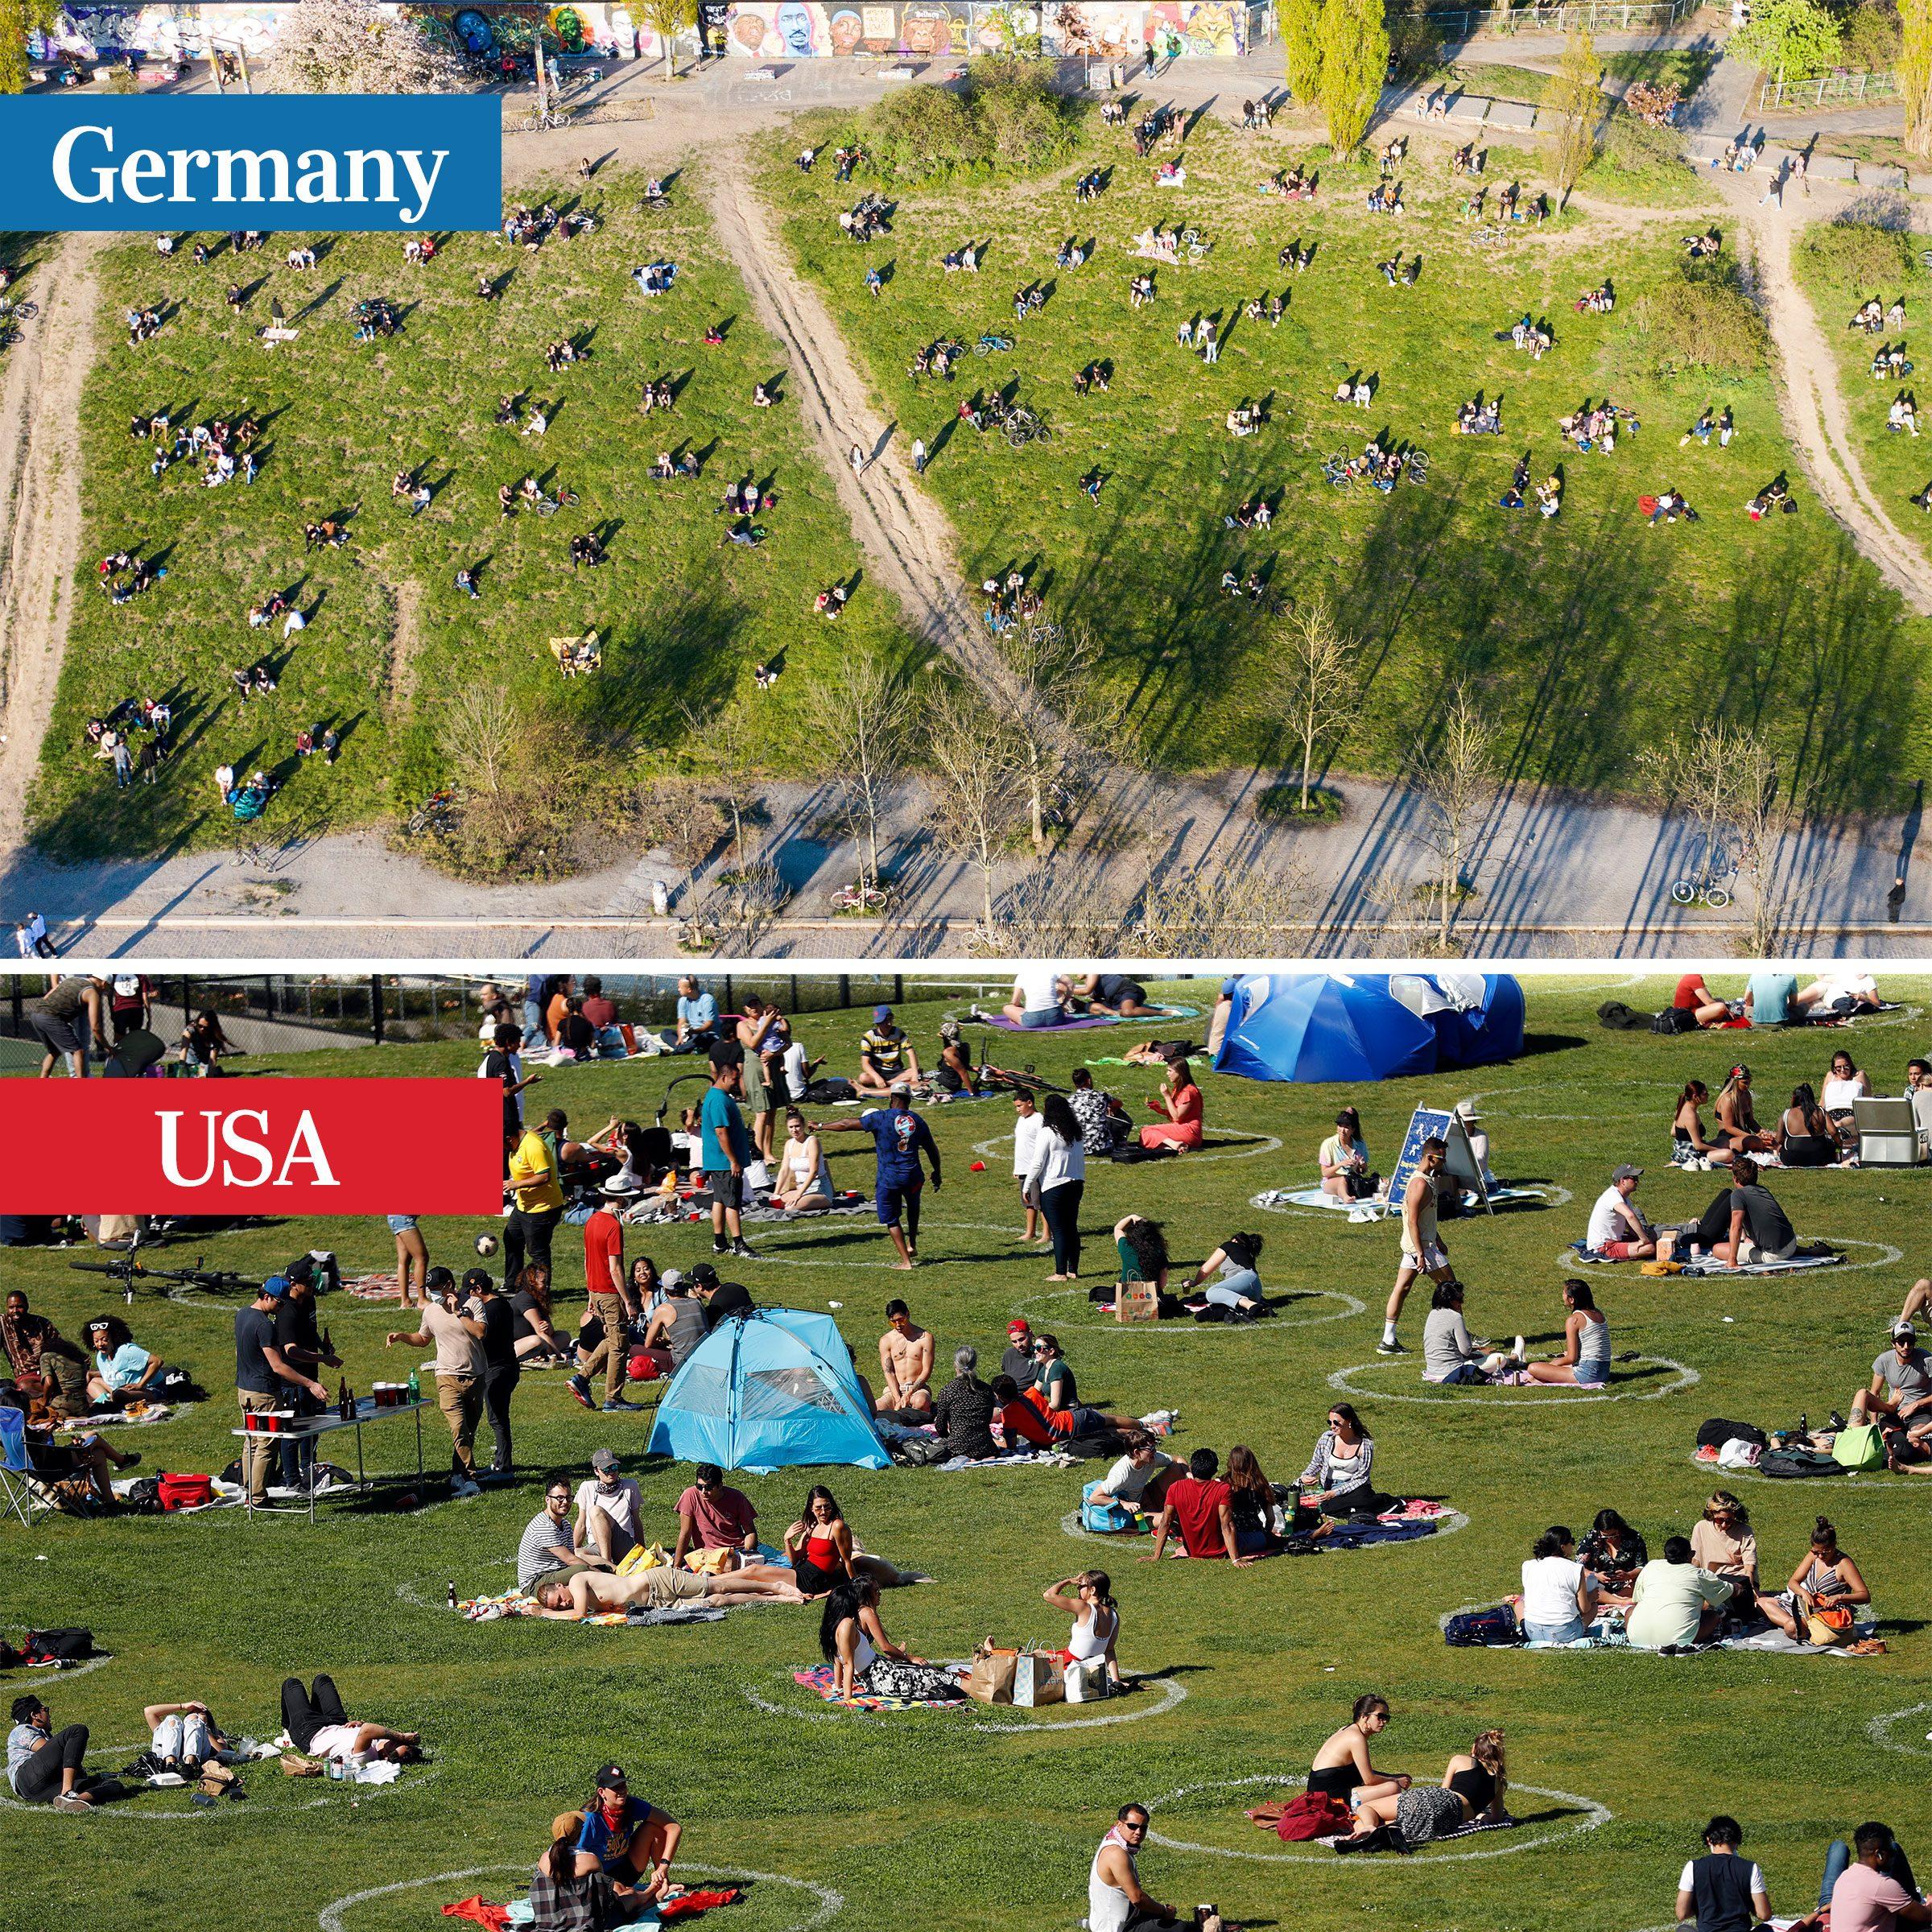 germany vs usa - parks